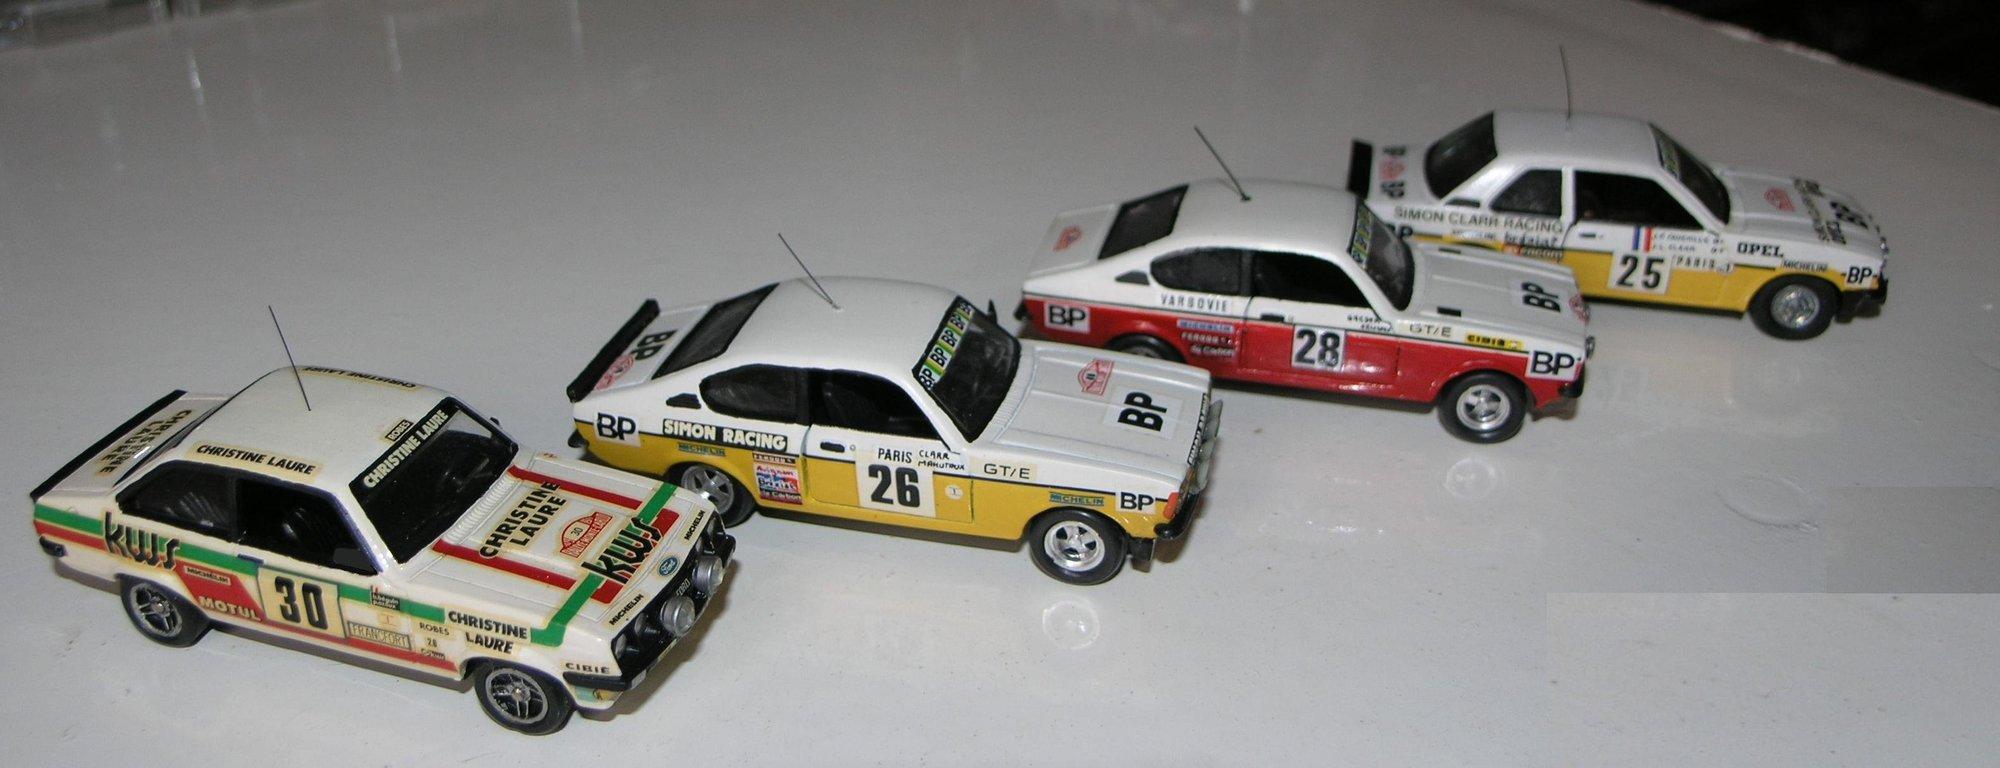 398432729_Opel_M-C_002.thumb.jpg.a0297567cc8d77e14b870f207e96e112.jpg